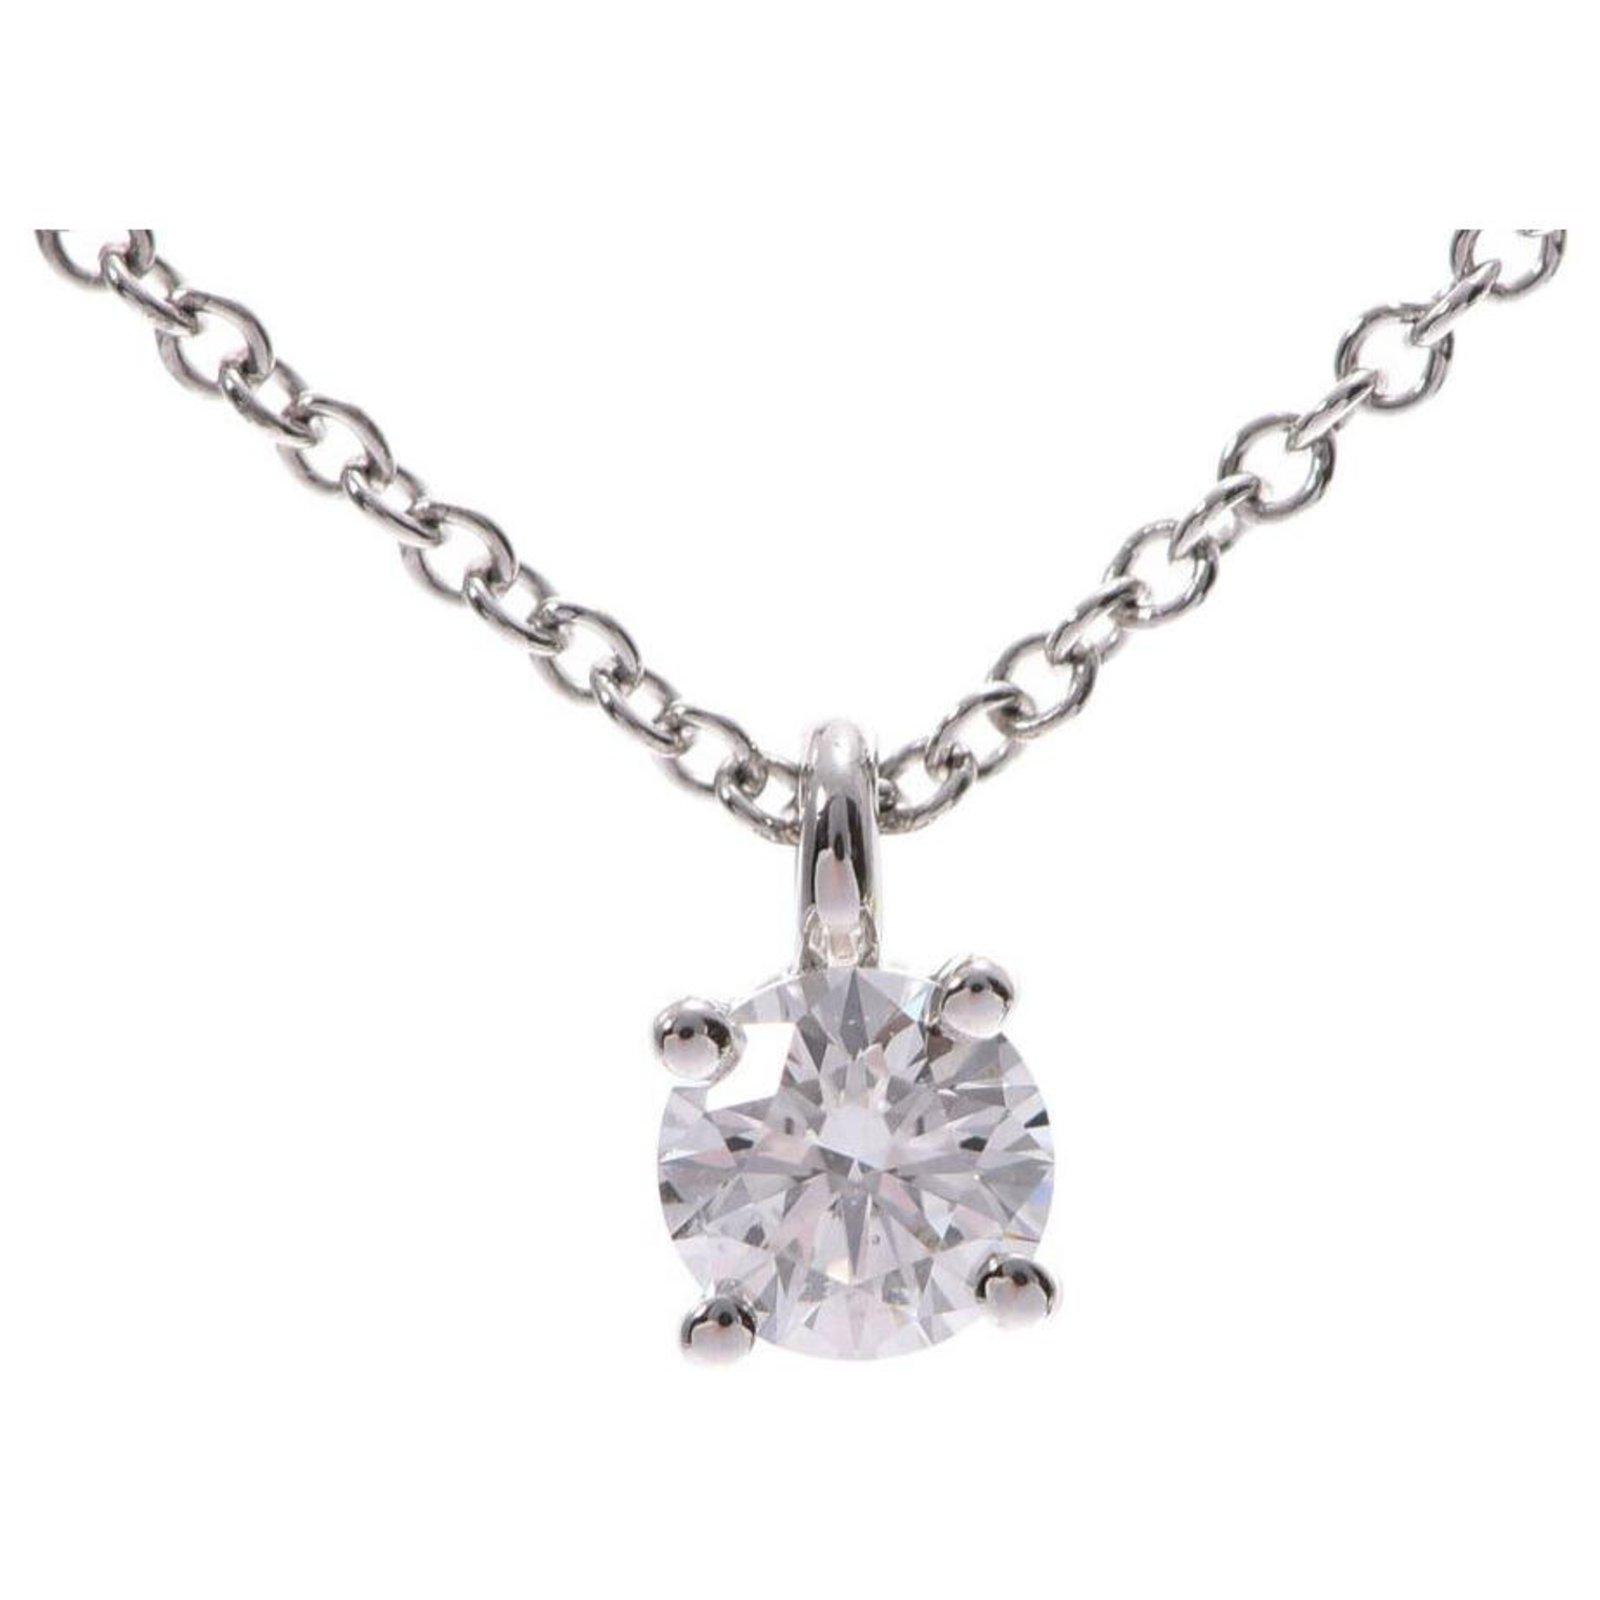 Tiffany Co Tiffany Co Solitaire Necklace Diamond Necklaces Gold Plated Golden Ref 163802 Joli Closet